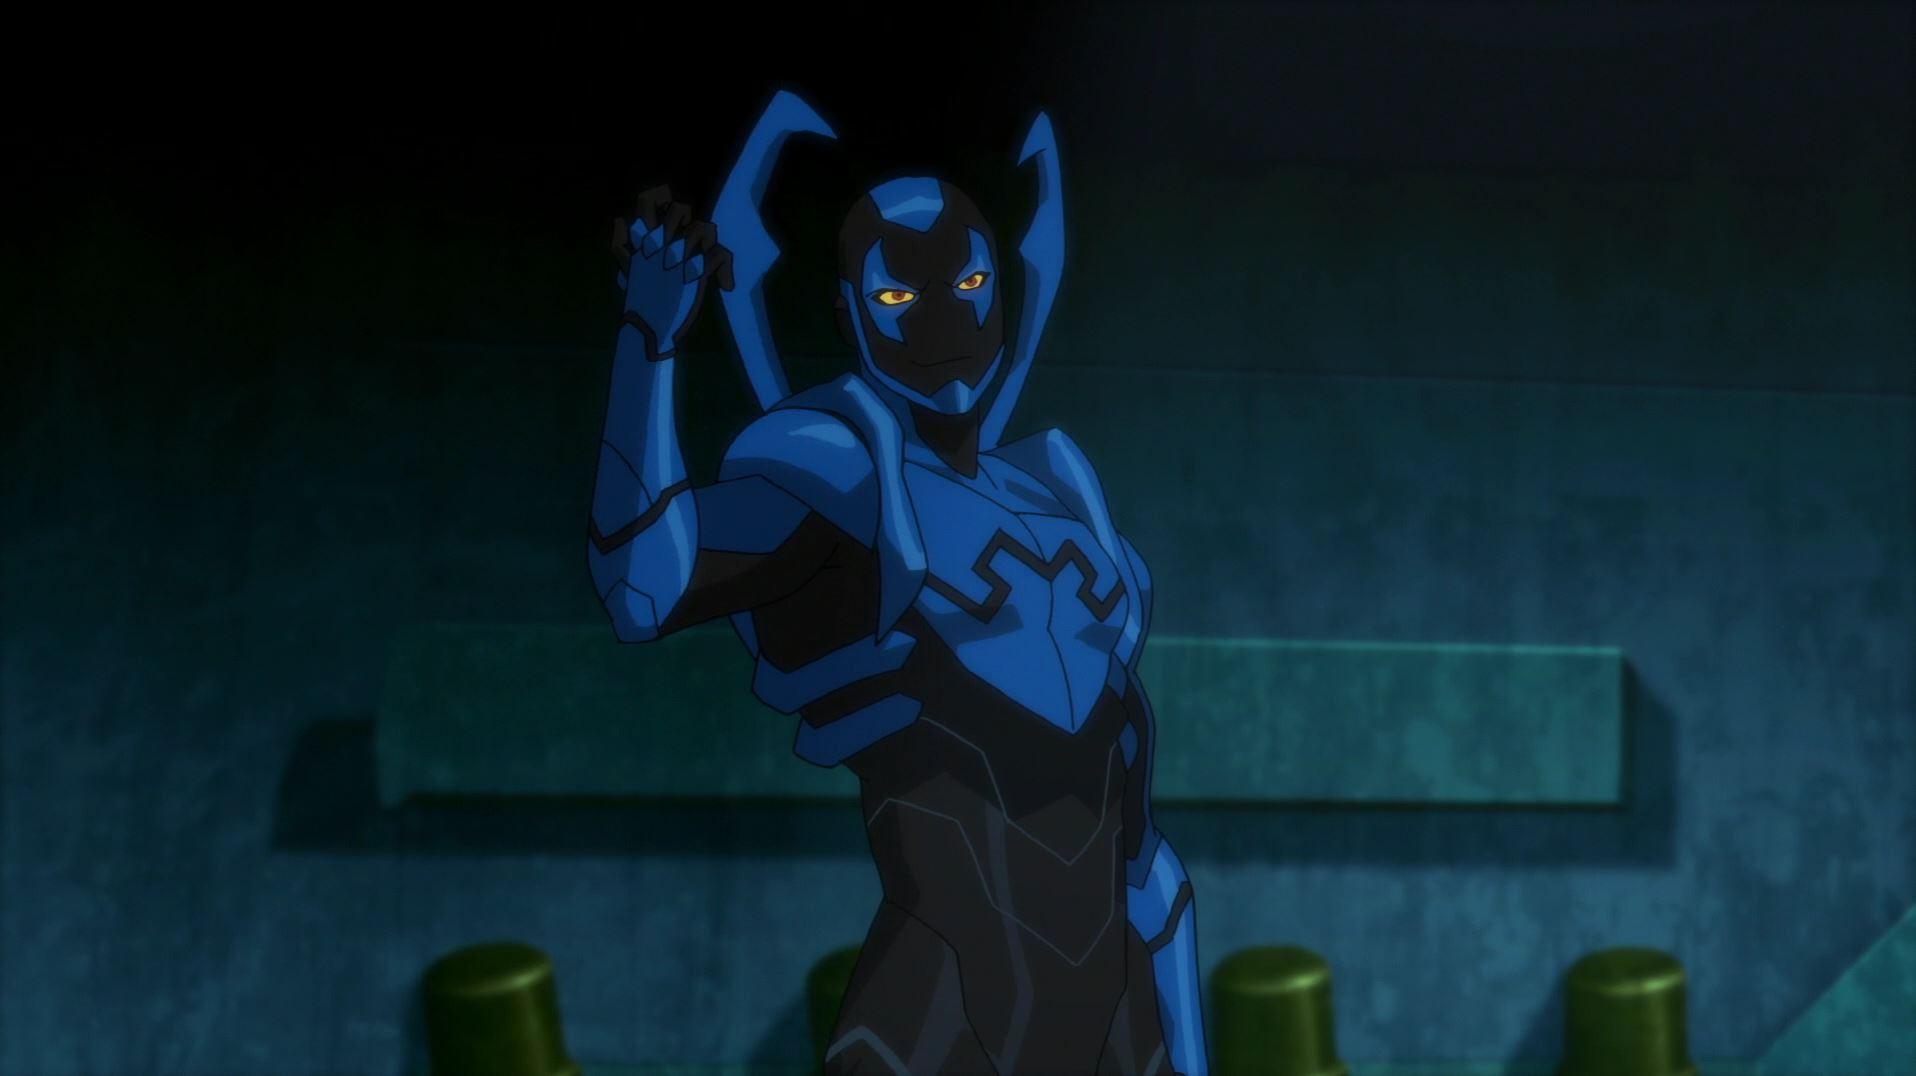 Jaime Reyes (DC Animated Movie Universe)